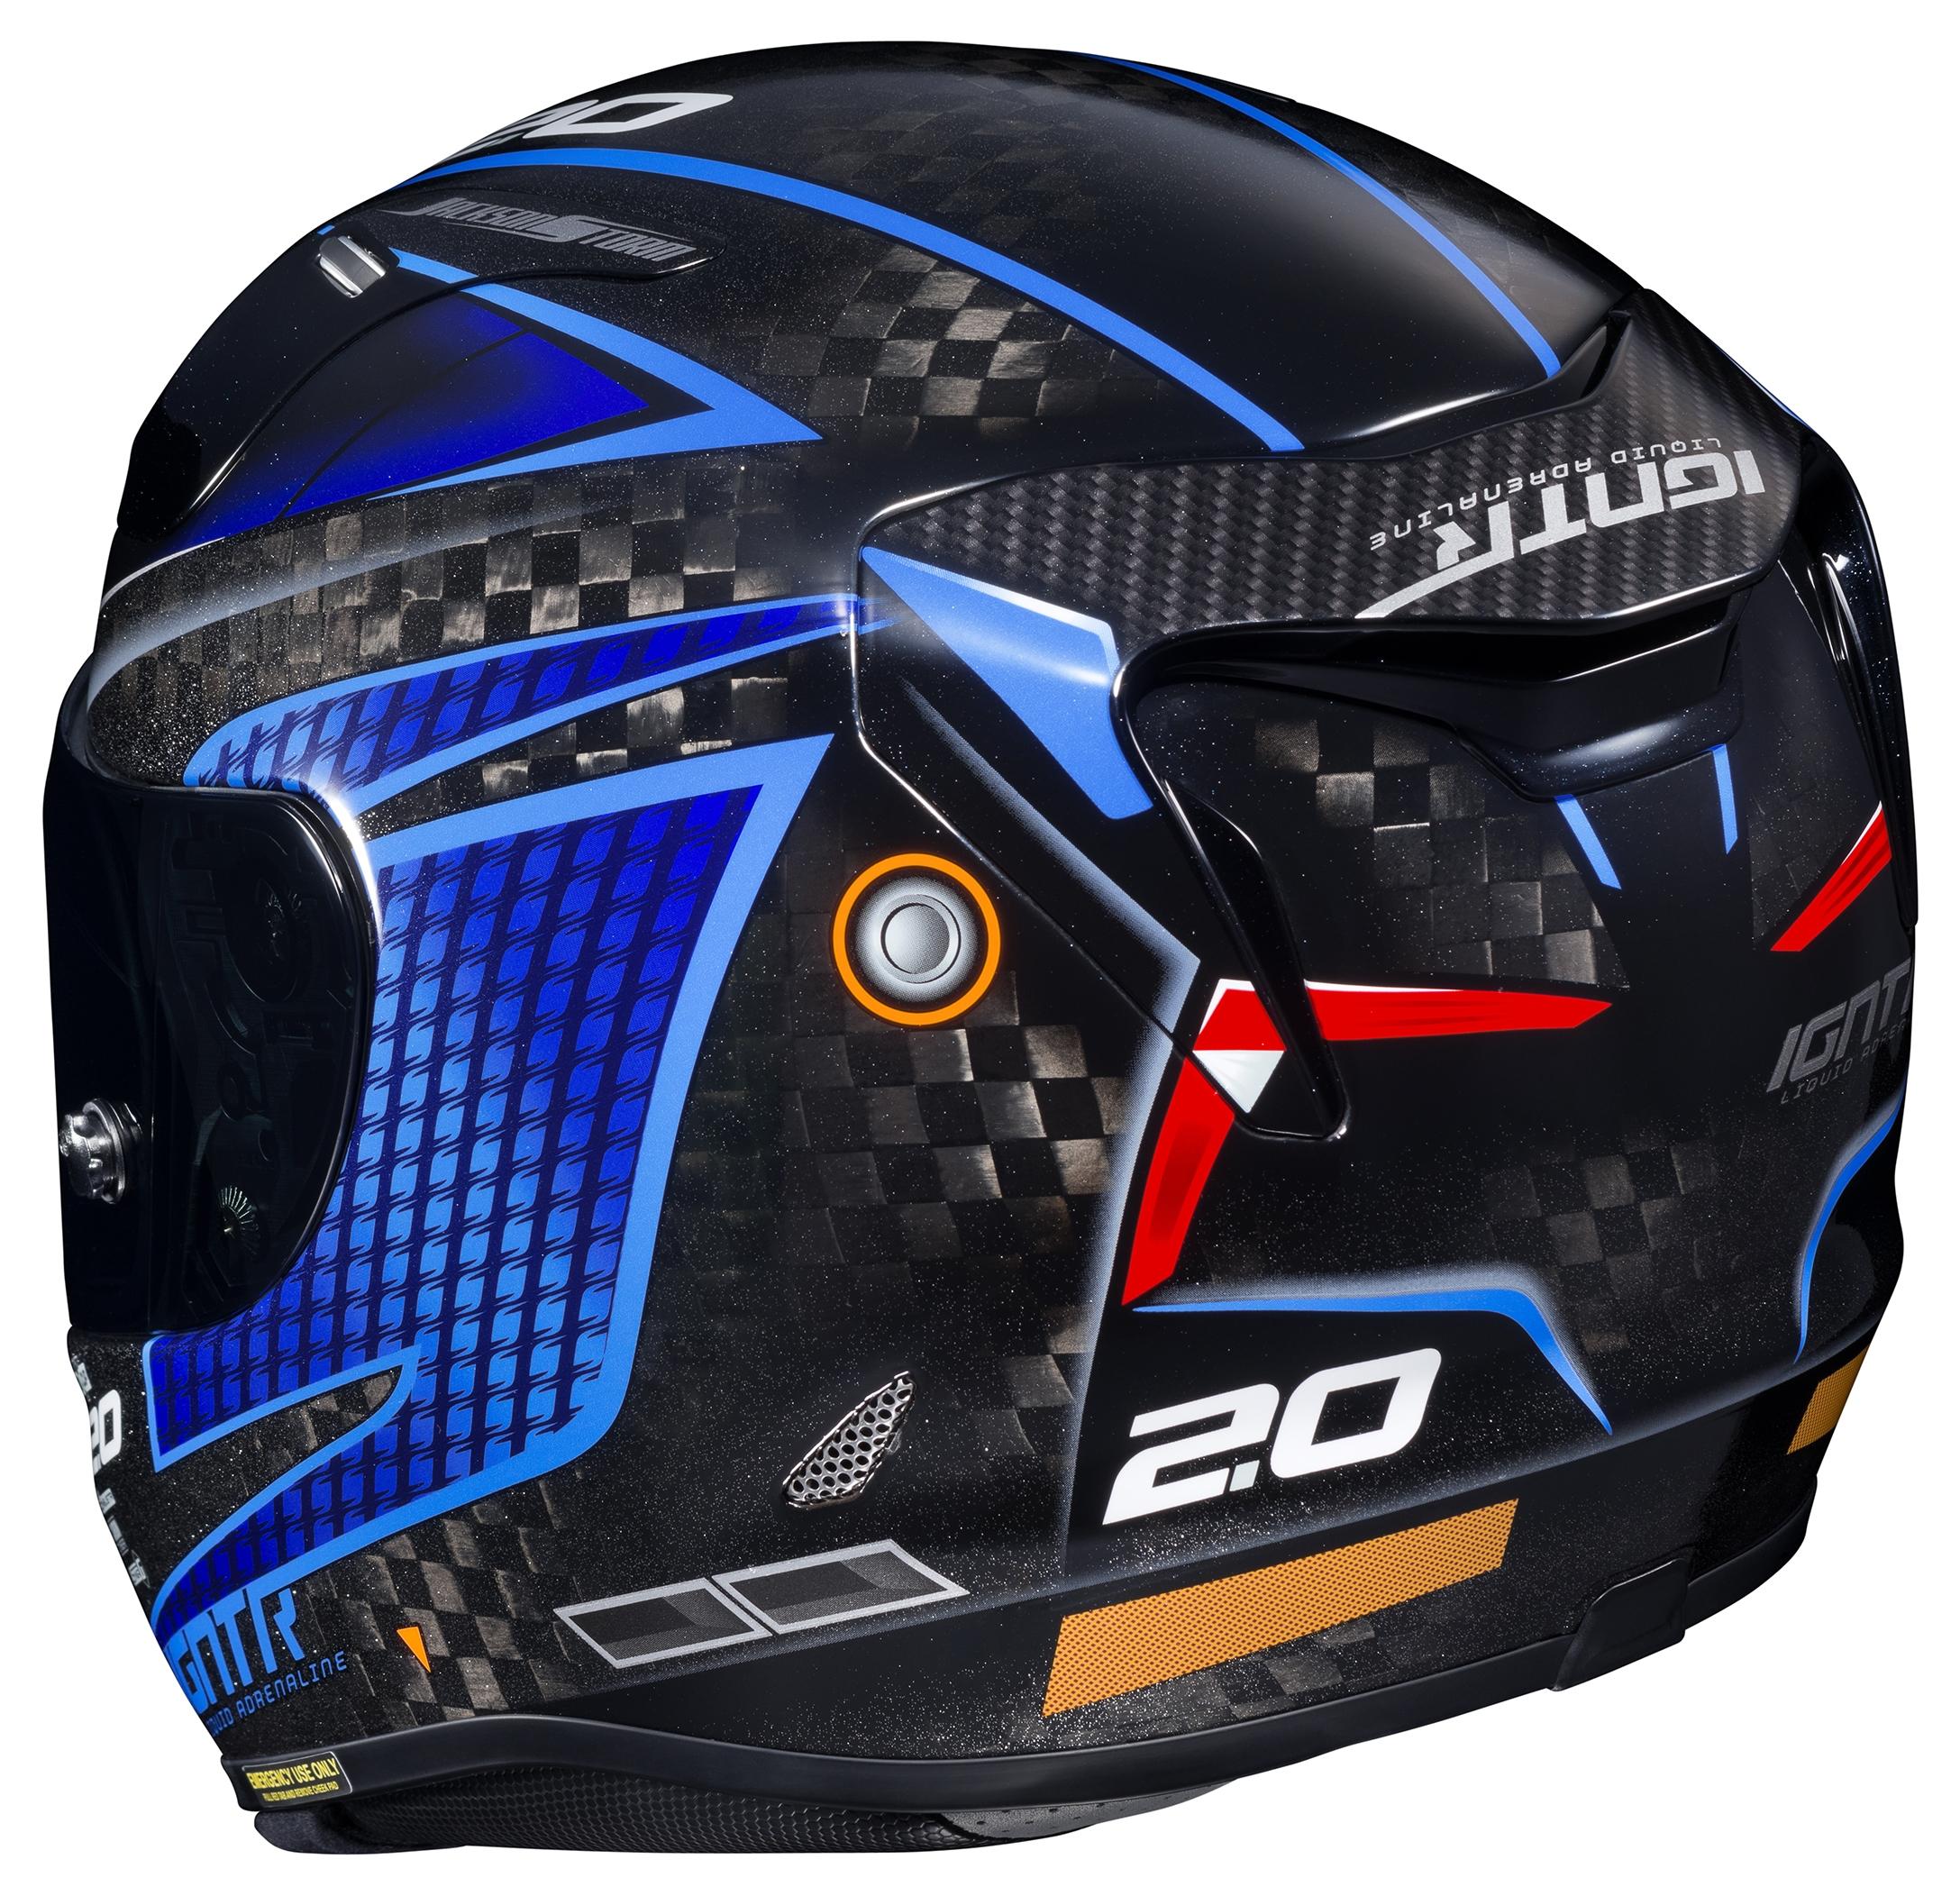 Hjc Rpha 11 >> Hjc Rpha 11 Pro Carbon Jackson Storm Helmet Cycle Gear